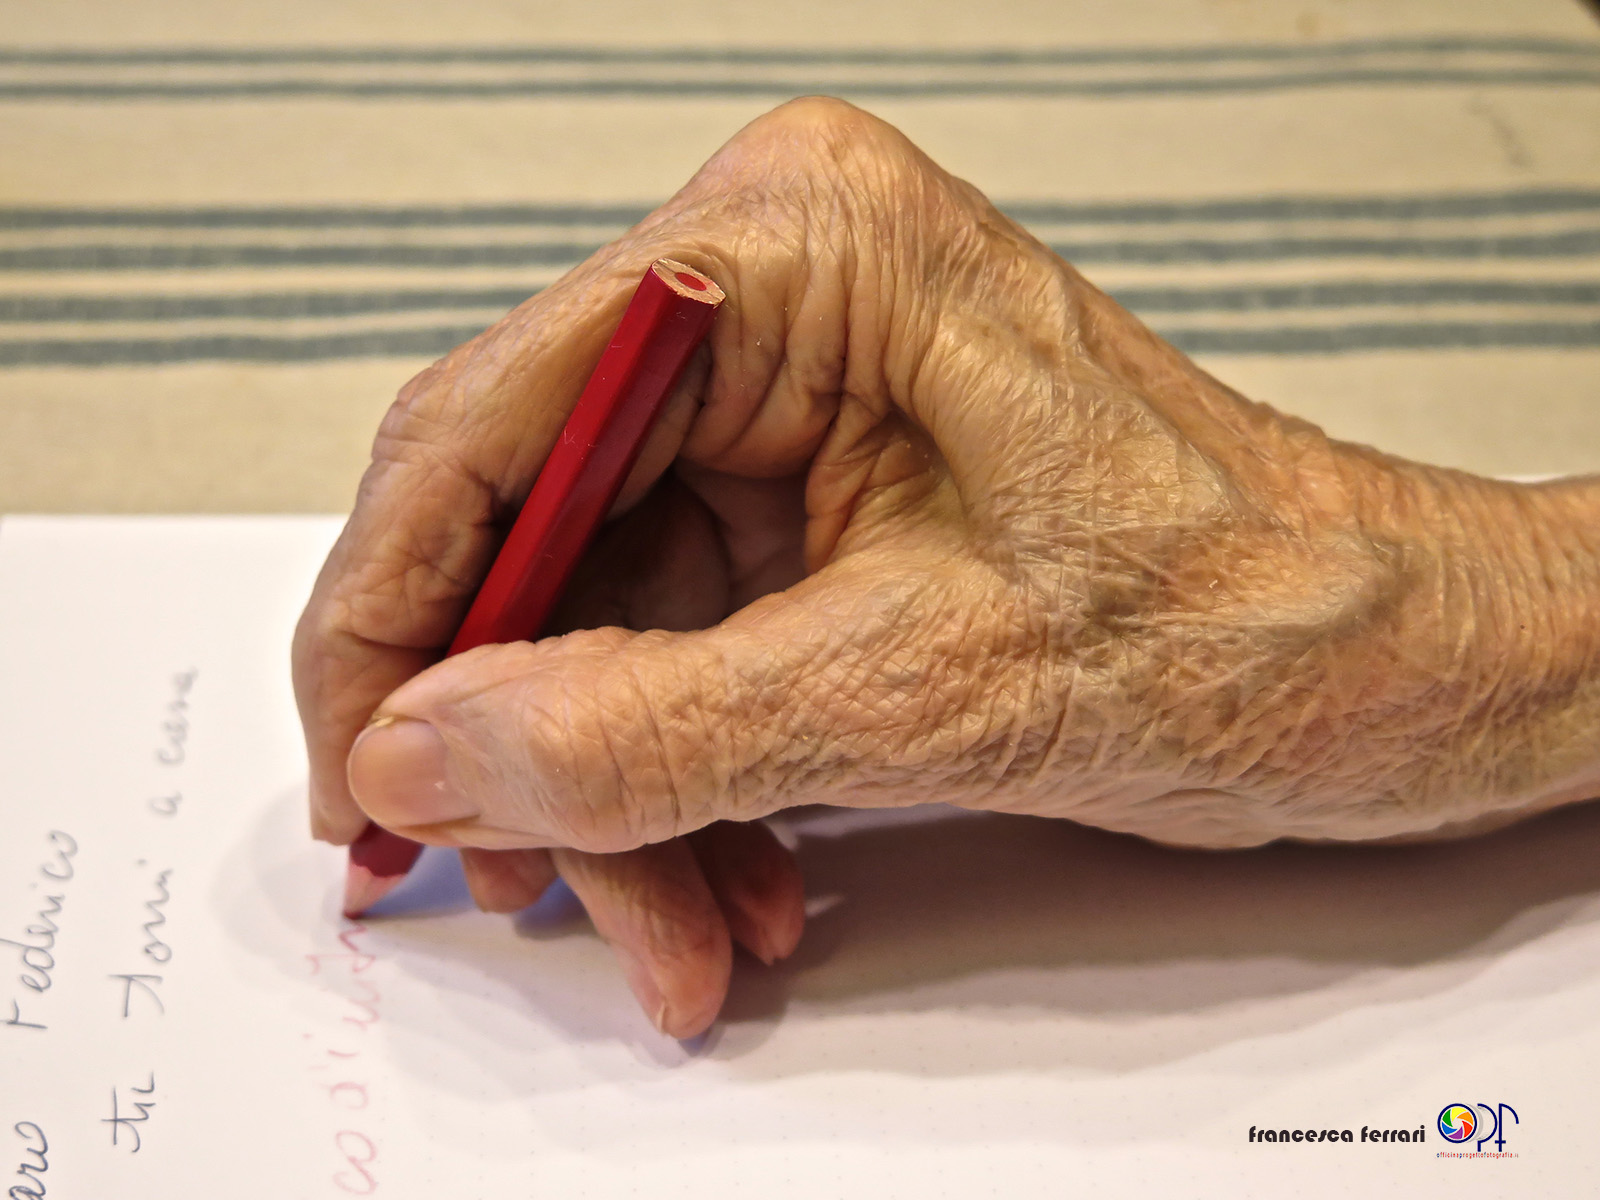 Le mani delle donne Francesca Ferrari